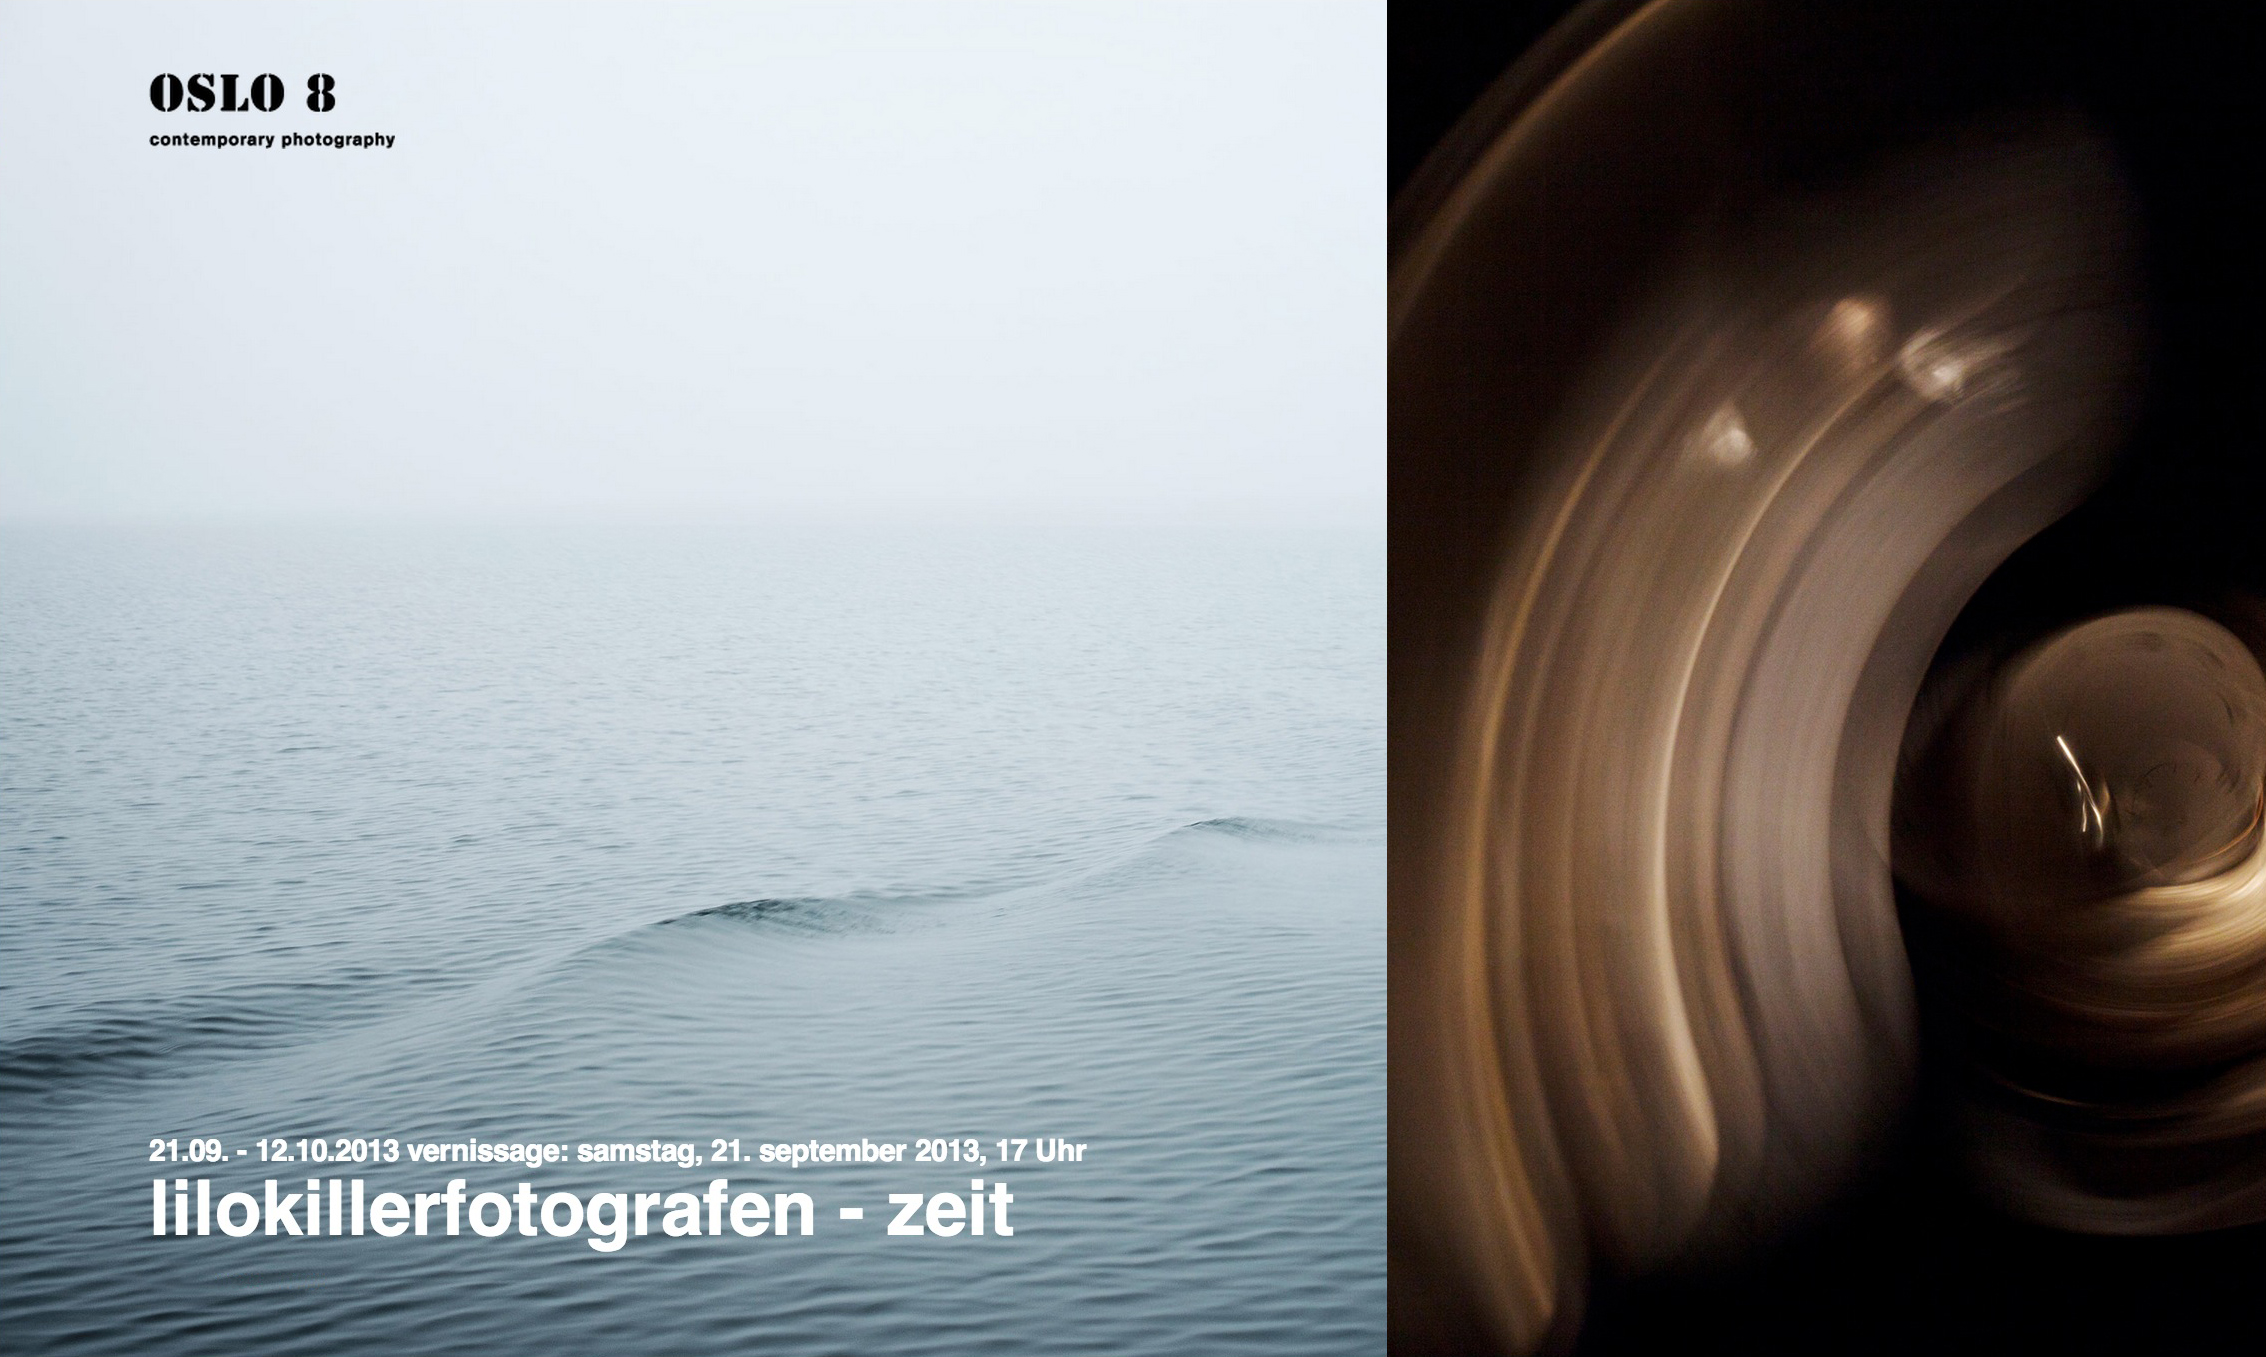 lilokillerfotografen.jpg